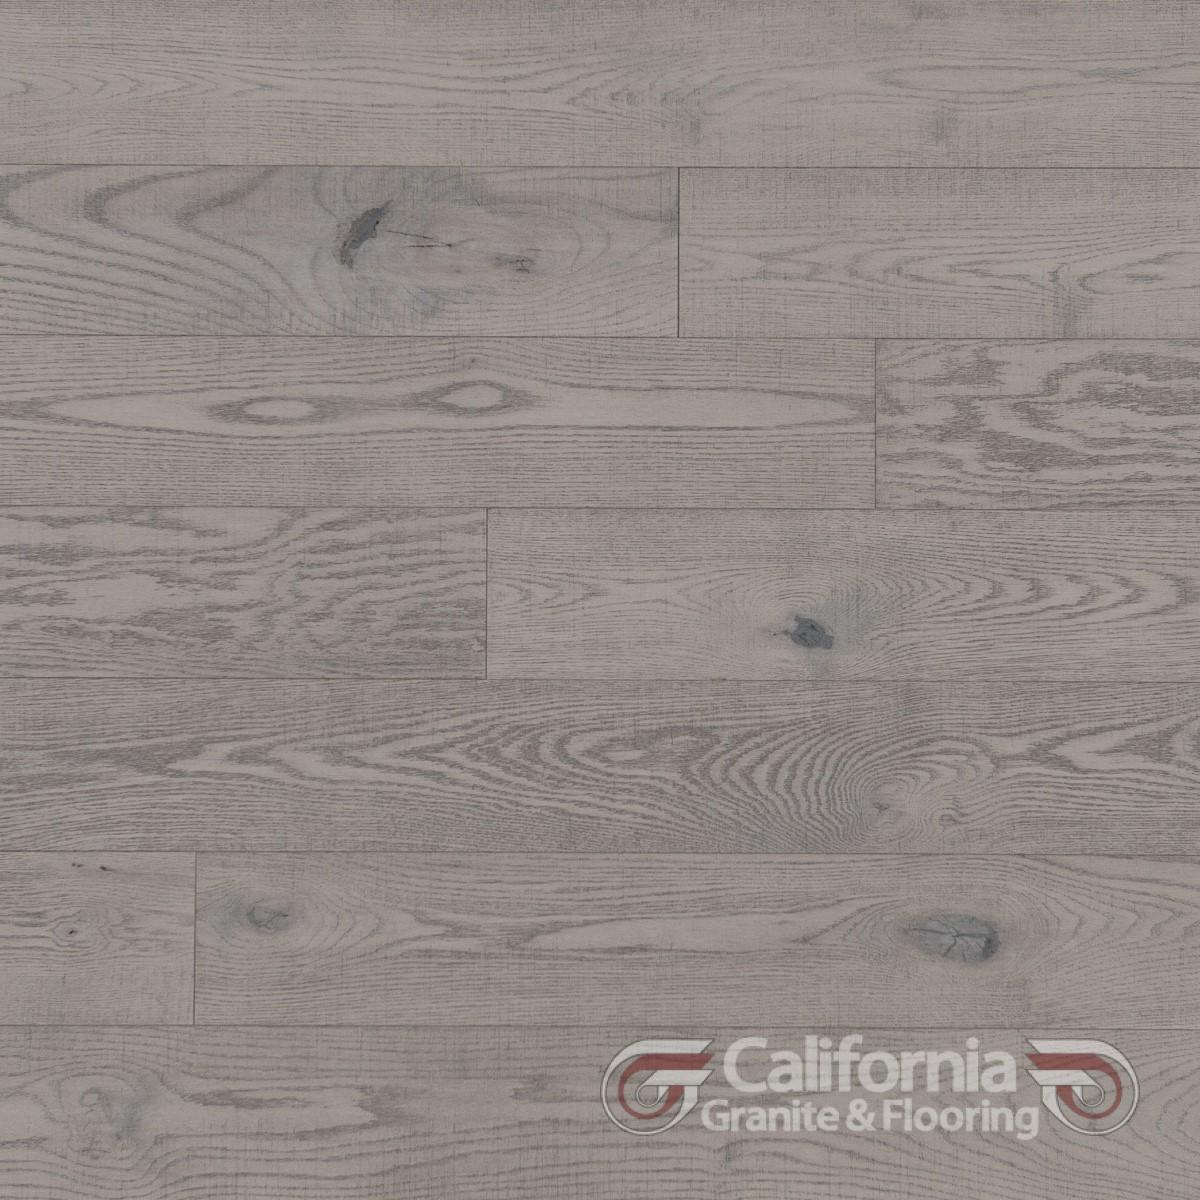 hardwood-flooring-red-oak-driftwood-character-cork-look-2